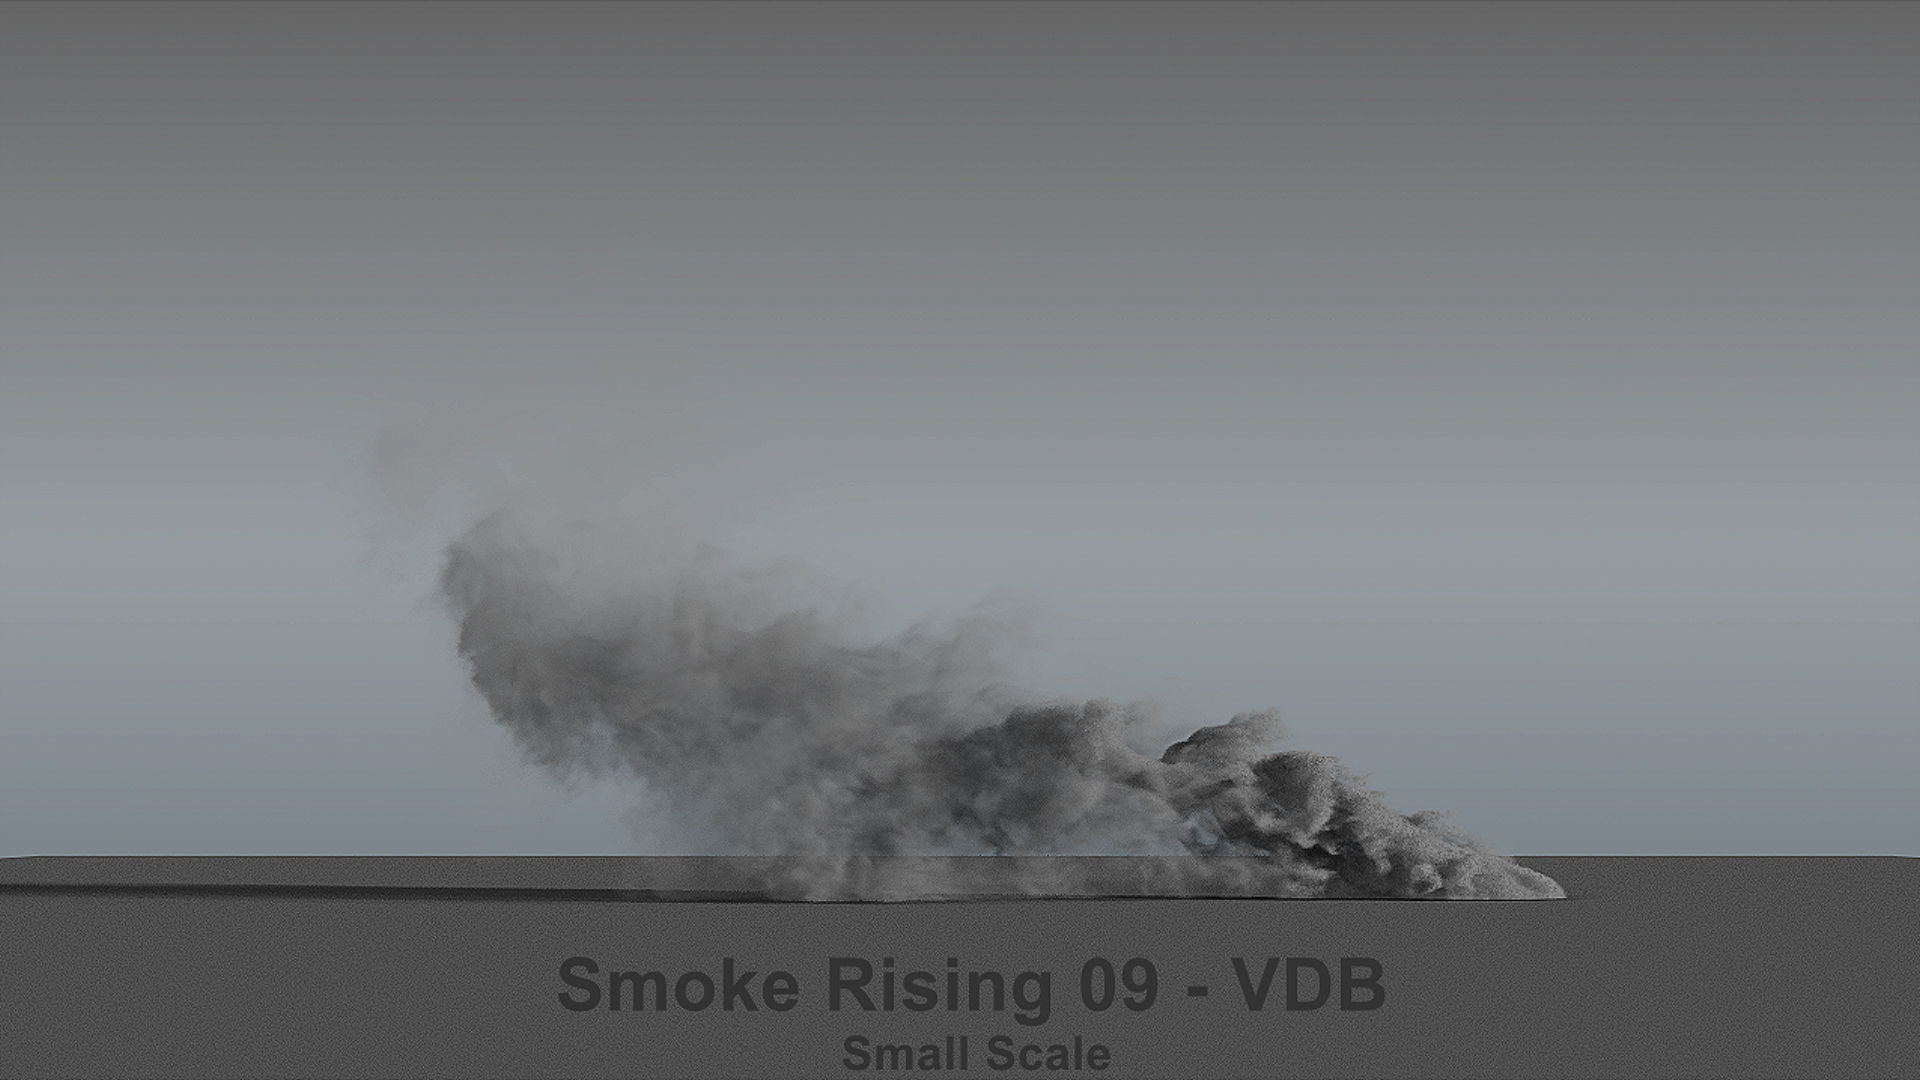 Smoke Rising 09 - VDB